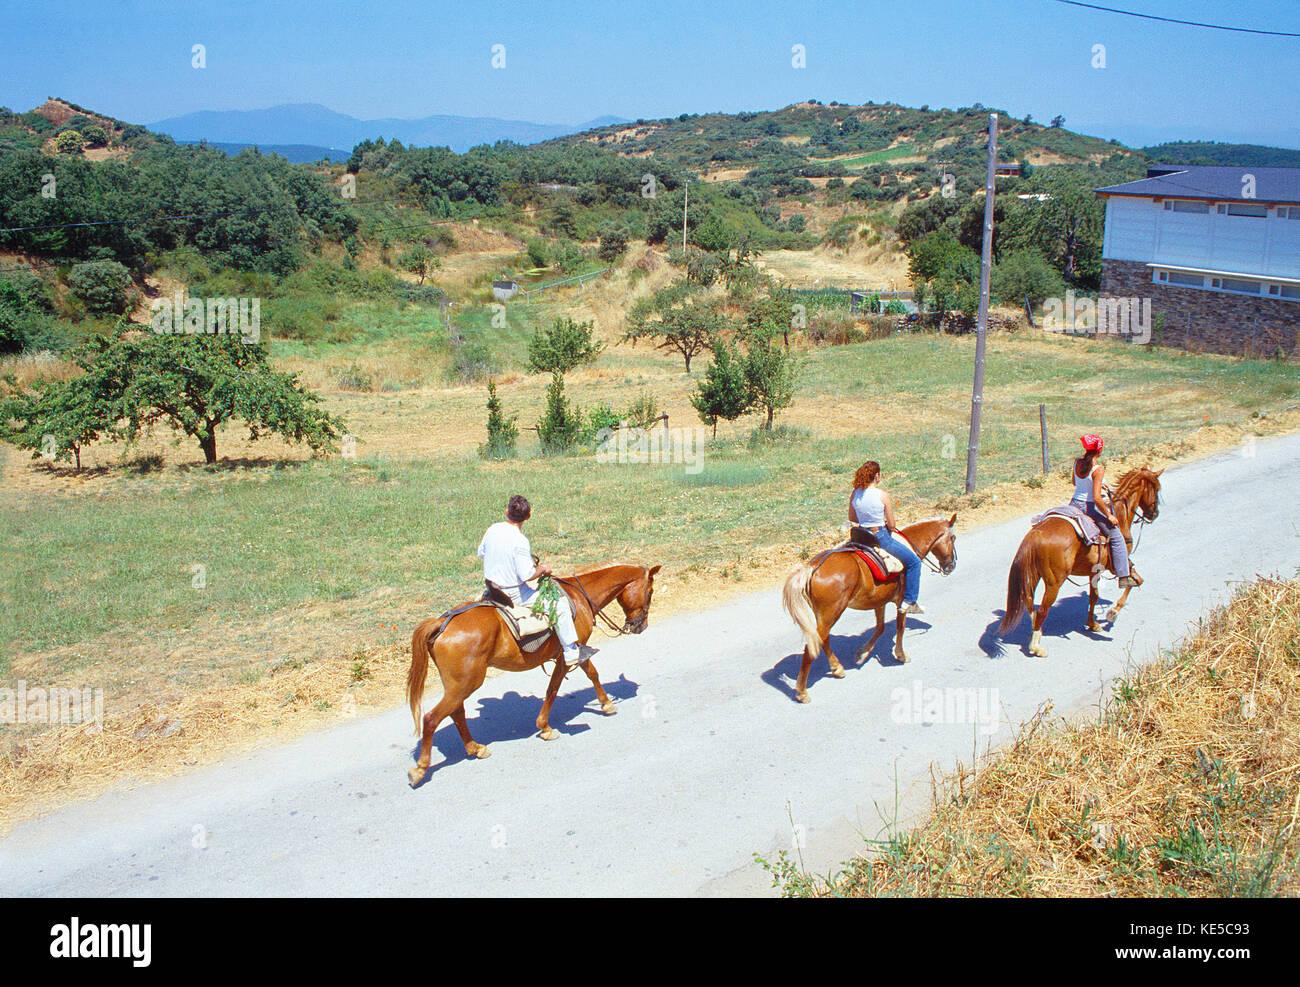 Three people riding horses. Las Medulas, Leon province, Castilla Leon, Spain. - Stock Image